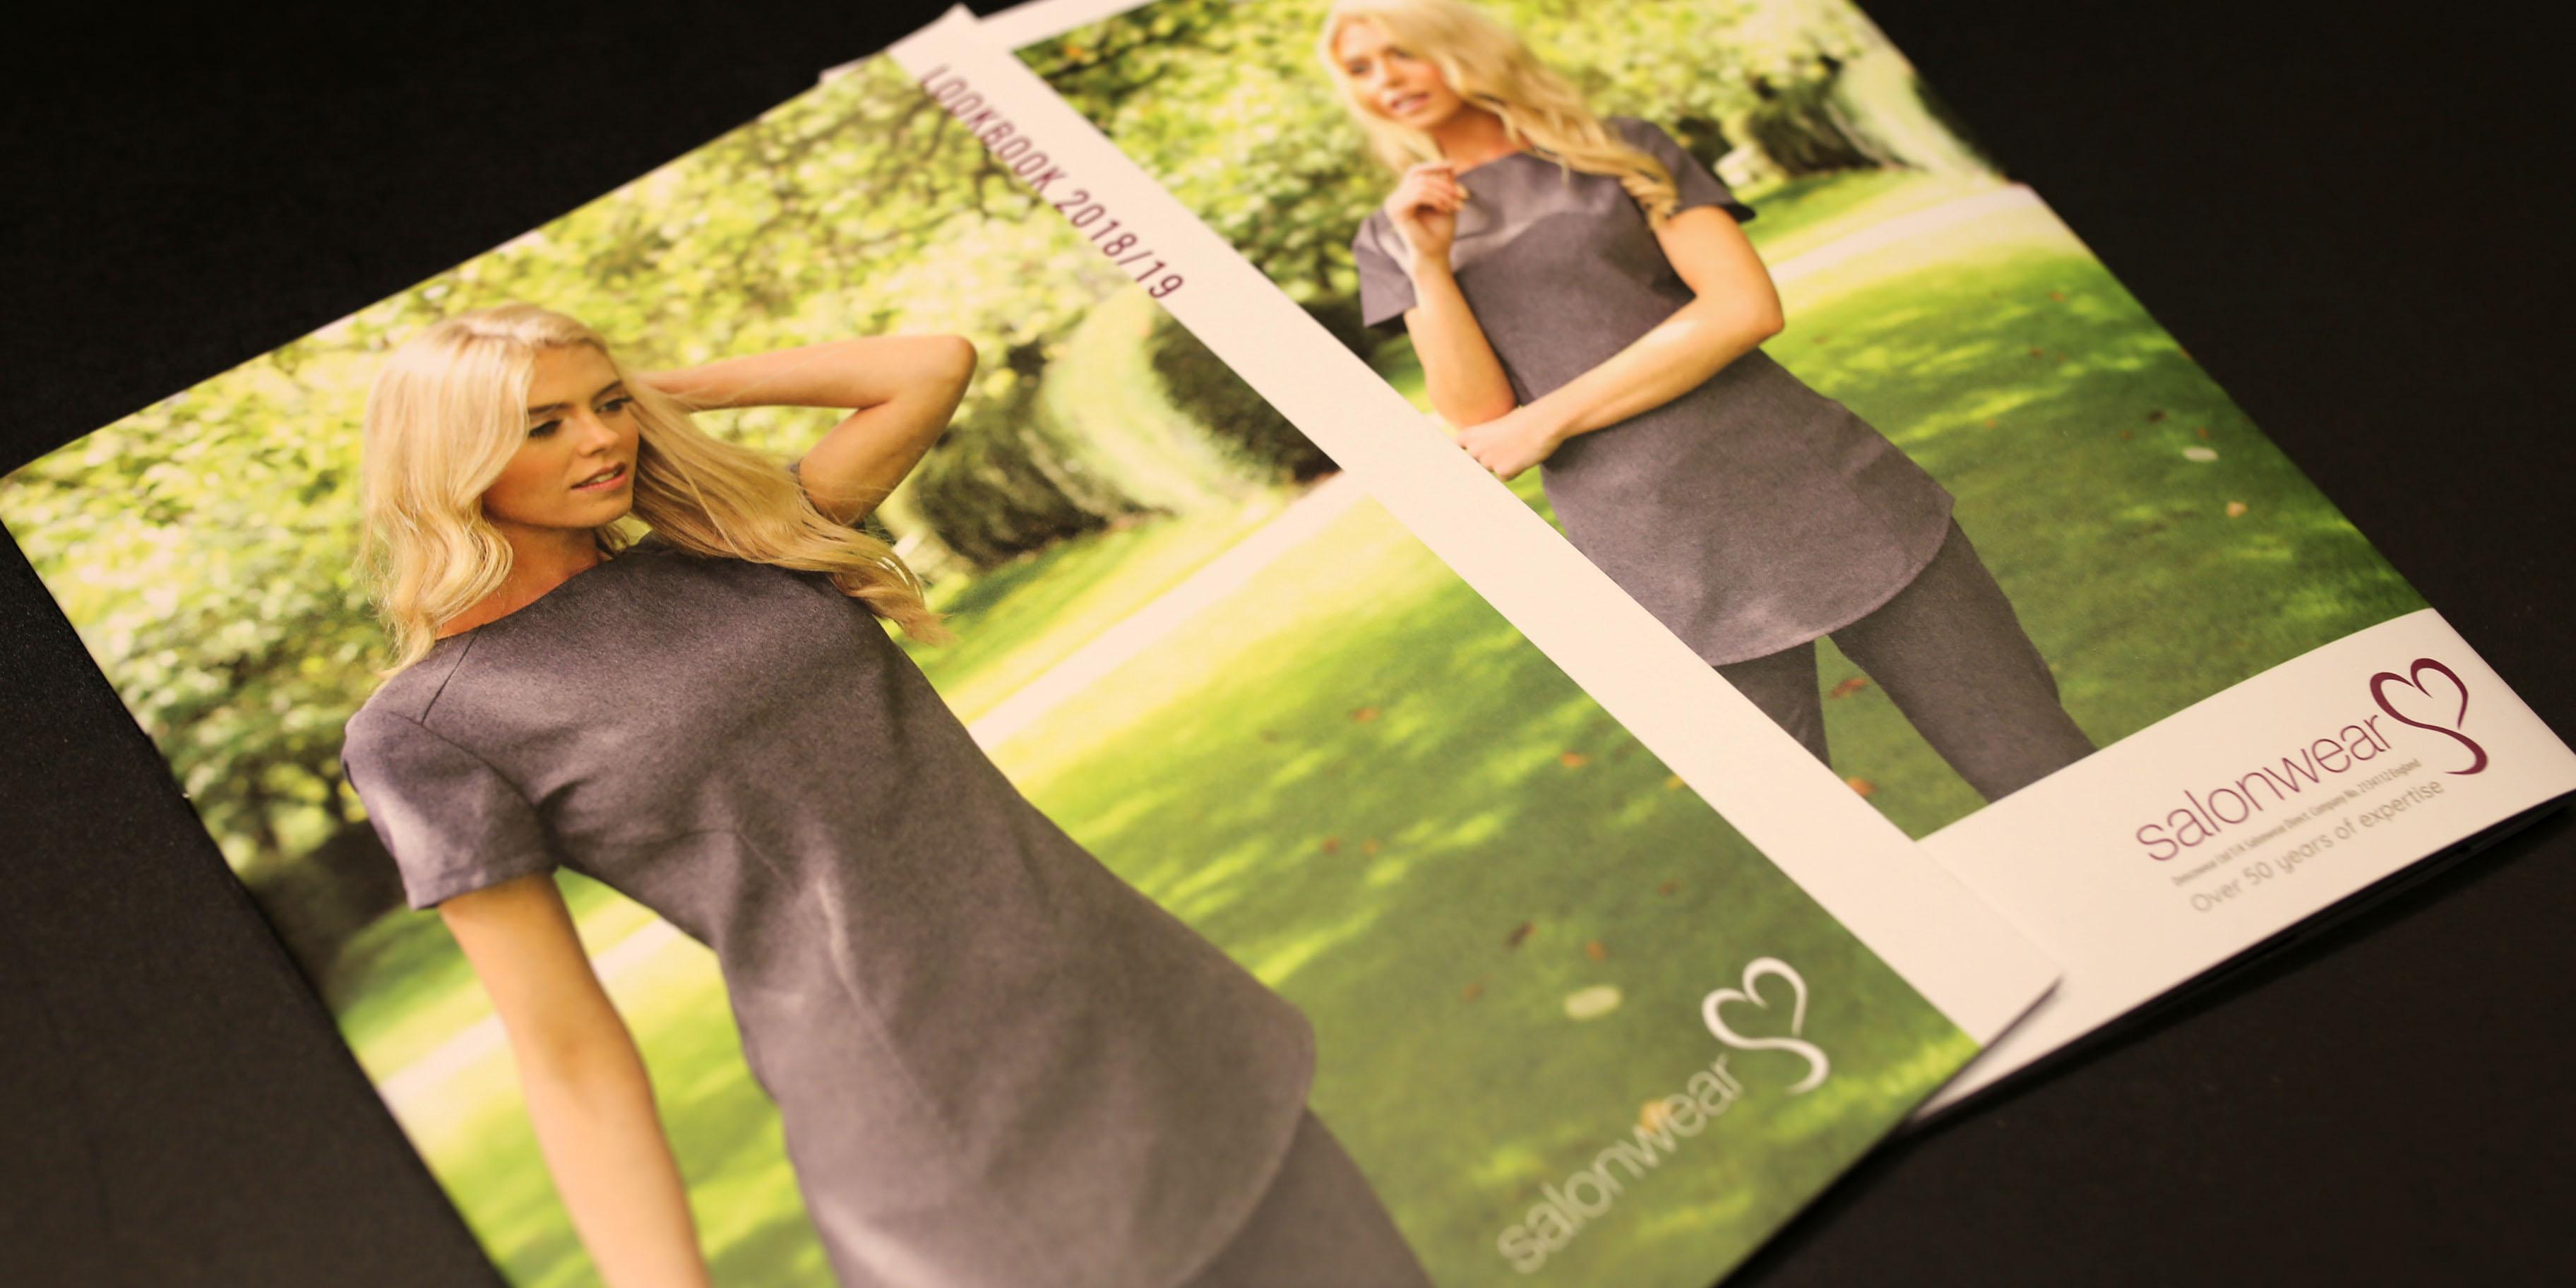 Salonwear Lookbook Cover